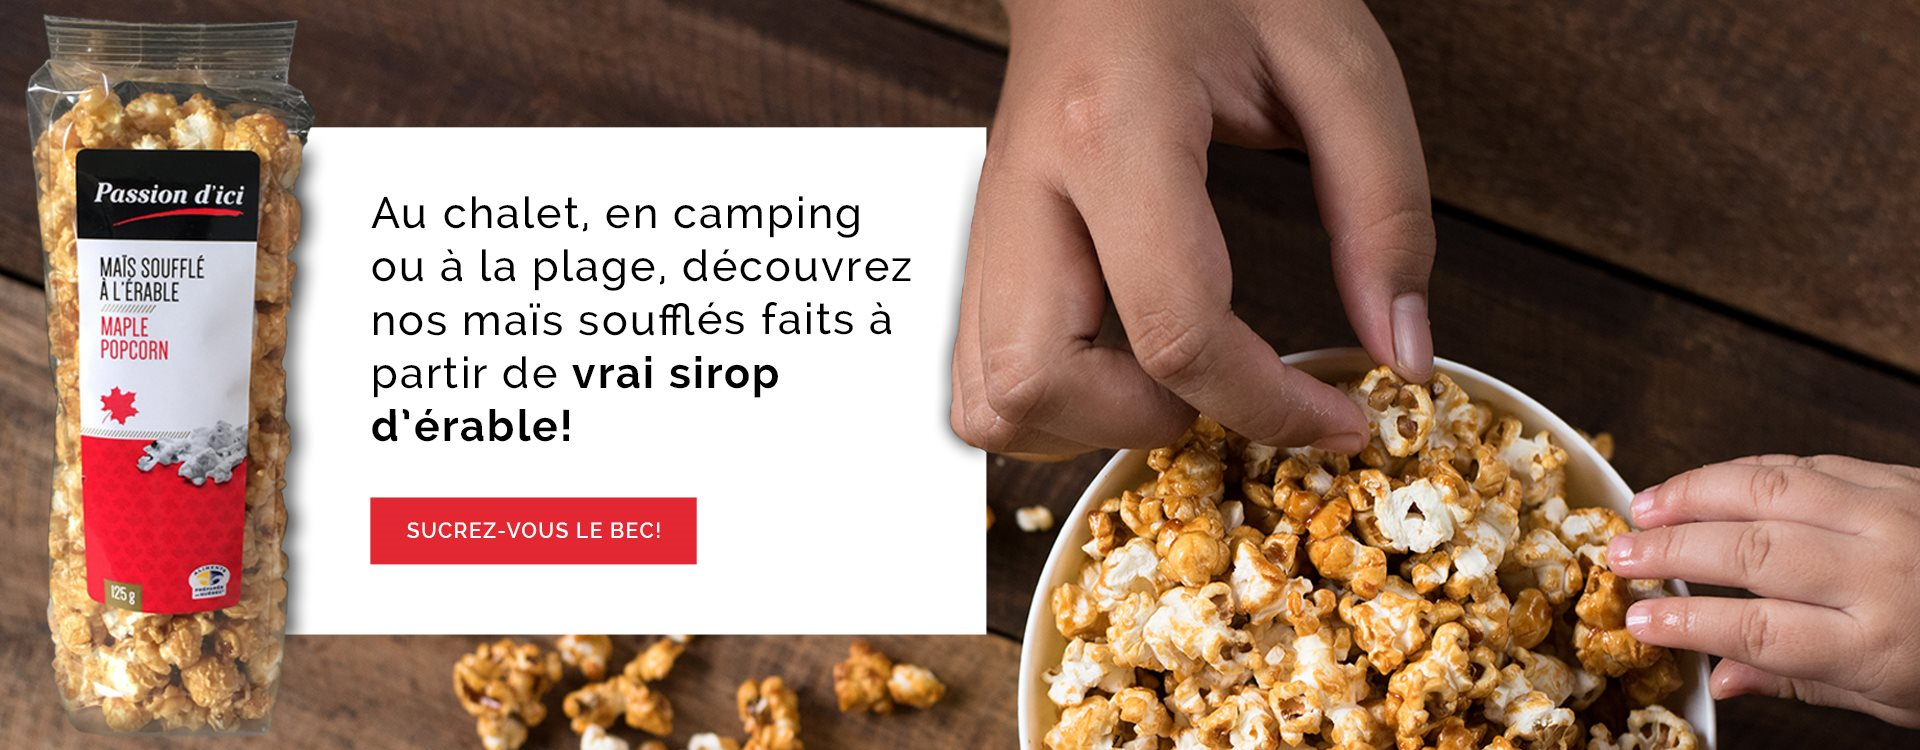 slide-11-popcorn-4